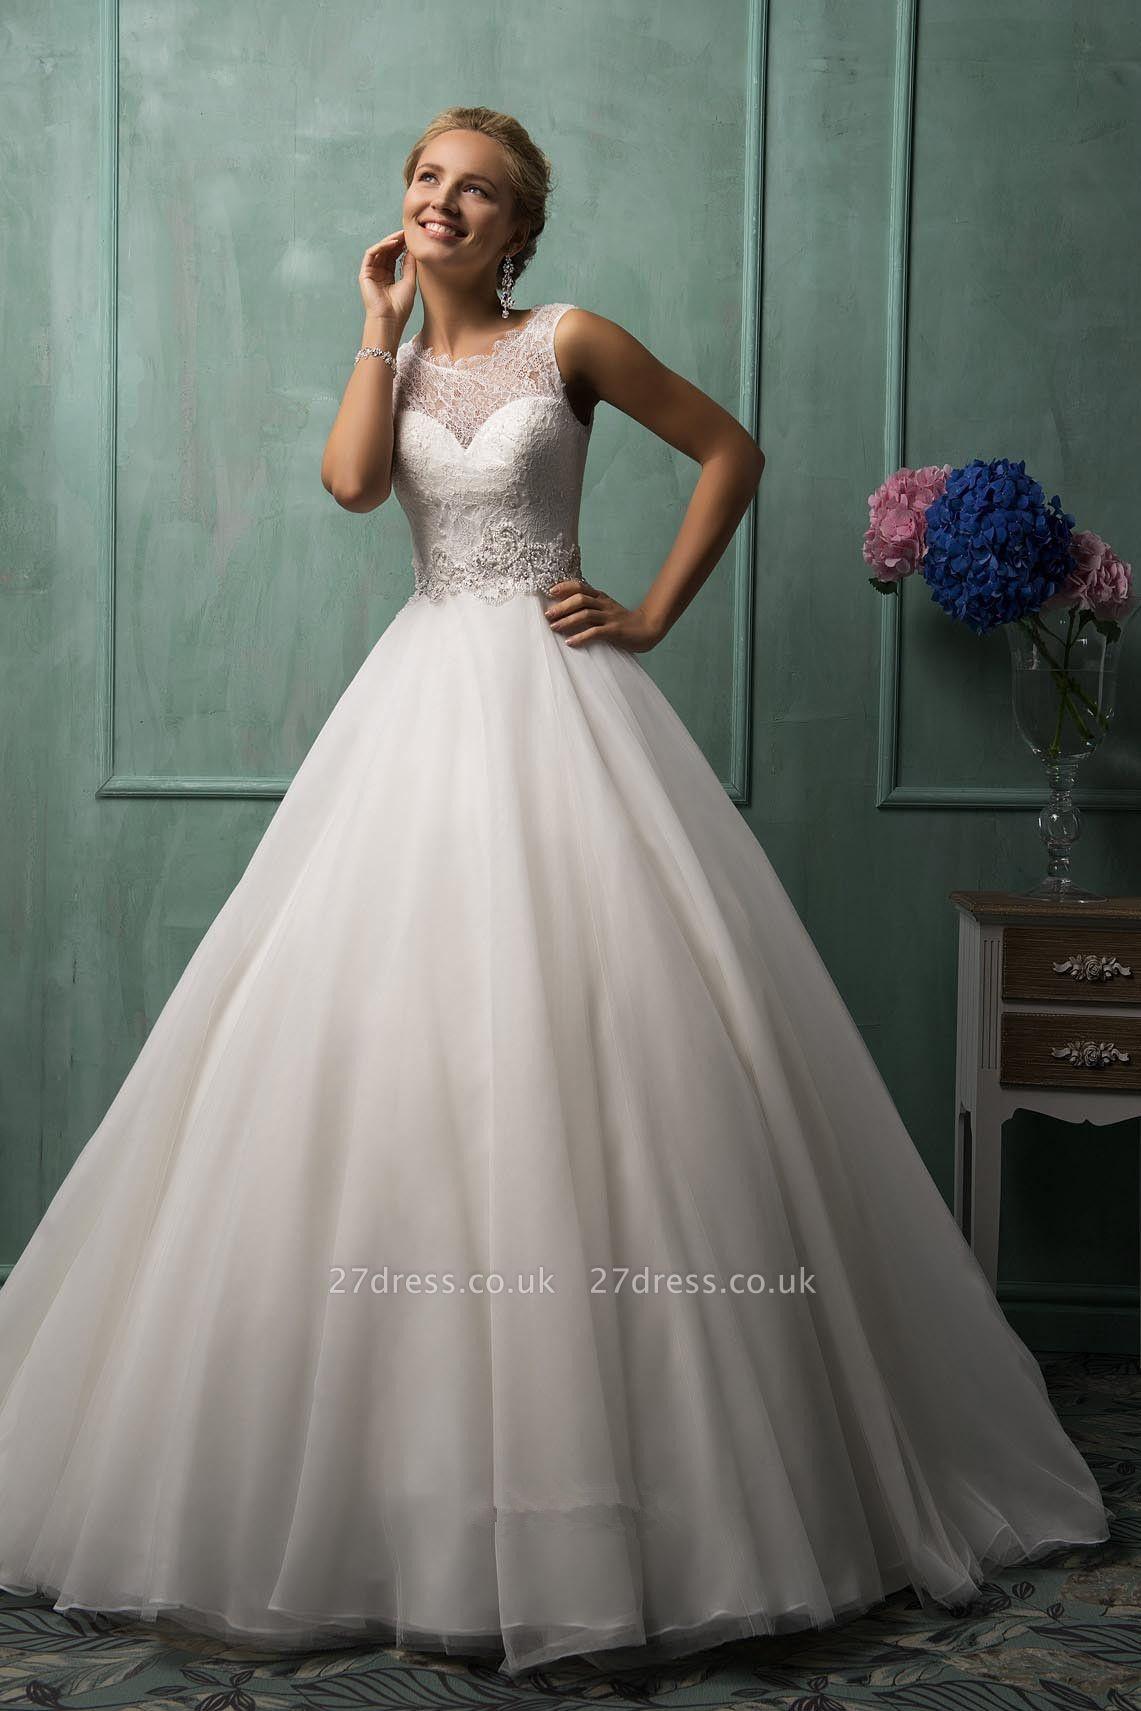 Timeless Illusion Princess Wedding Dress Lace Zipper Button Back